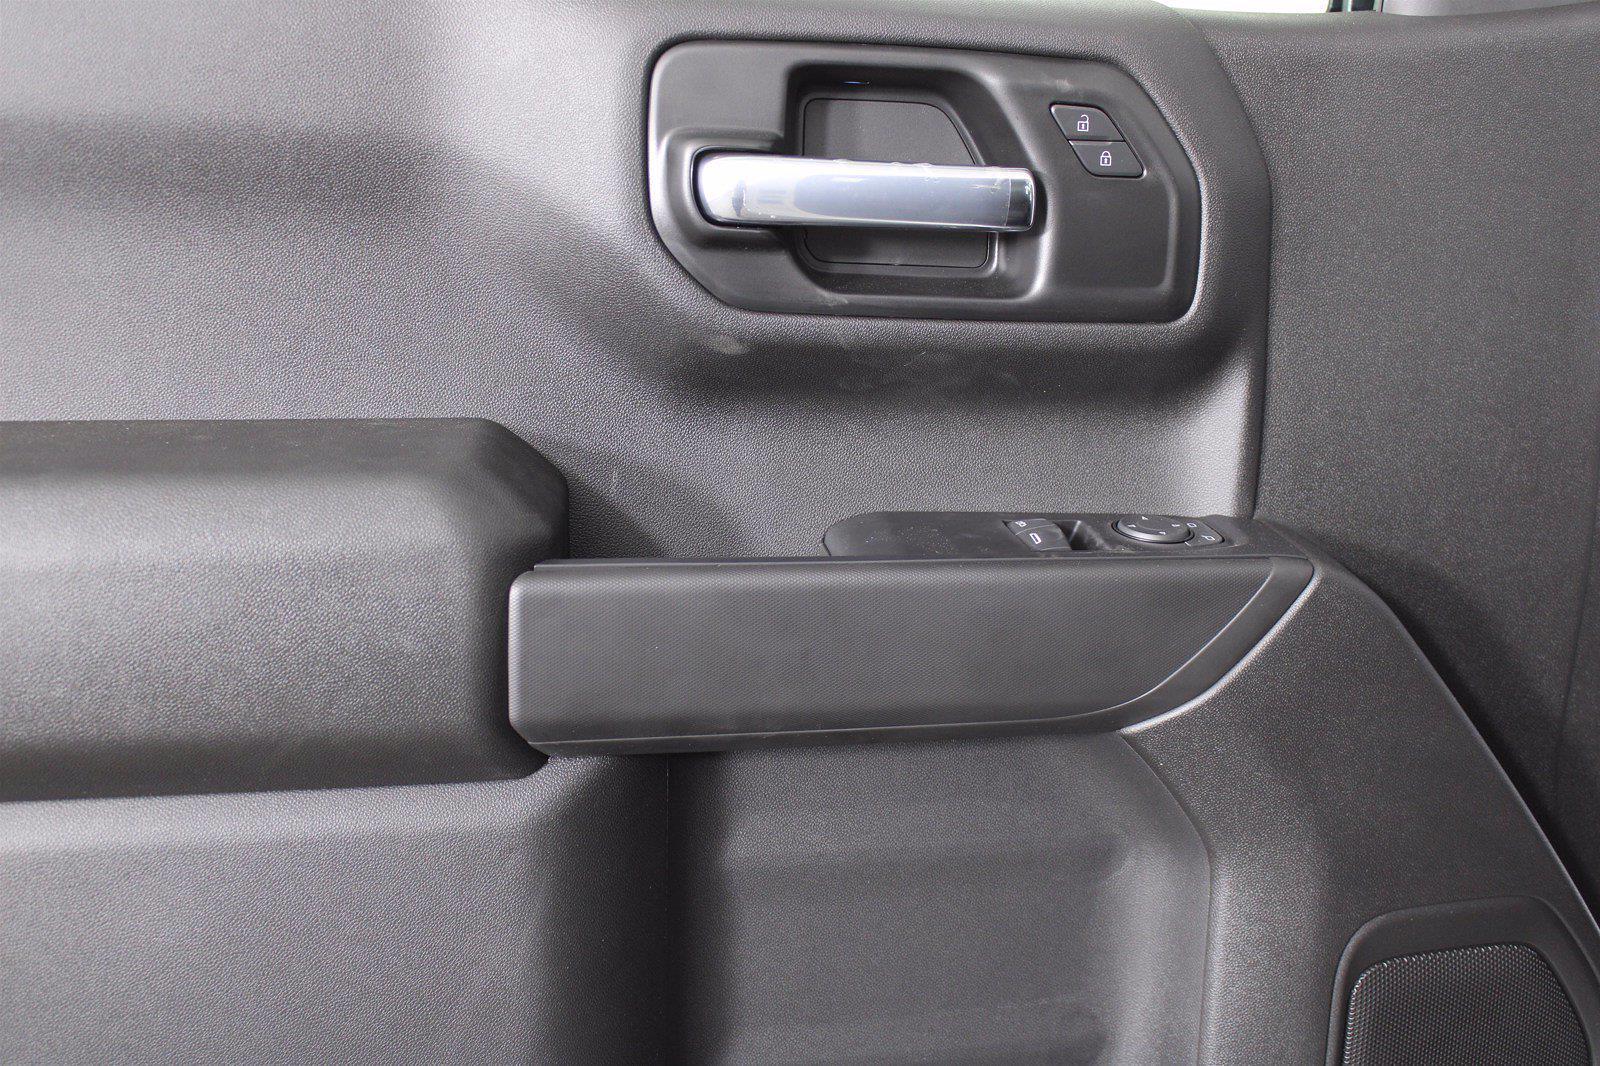 2021 Chevrolet Silverado 1500 Regular Cab 4x2, Pickup #D111066 - photo 11